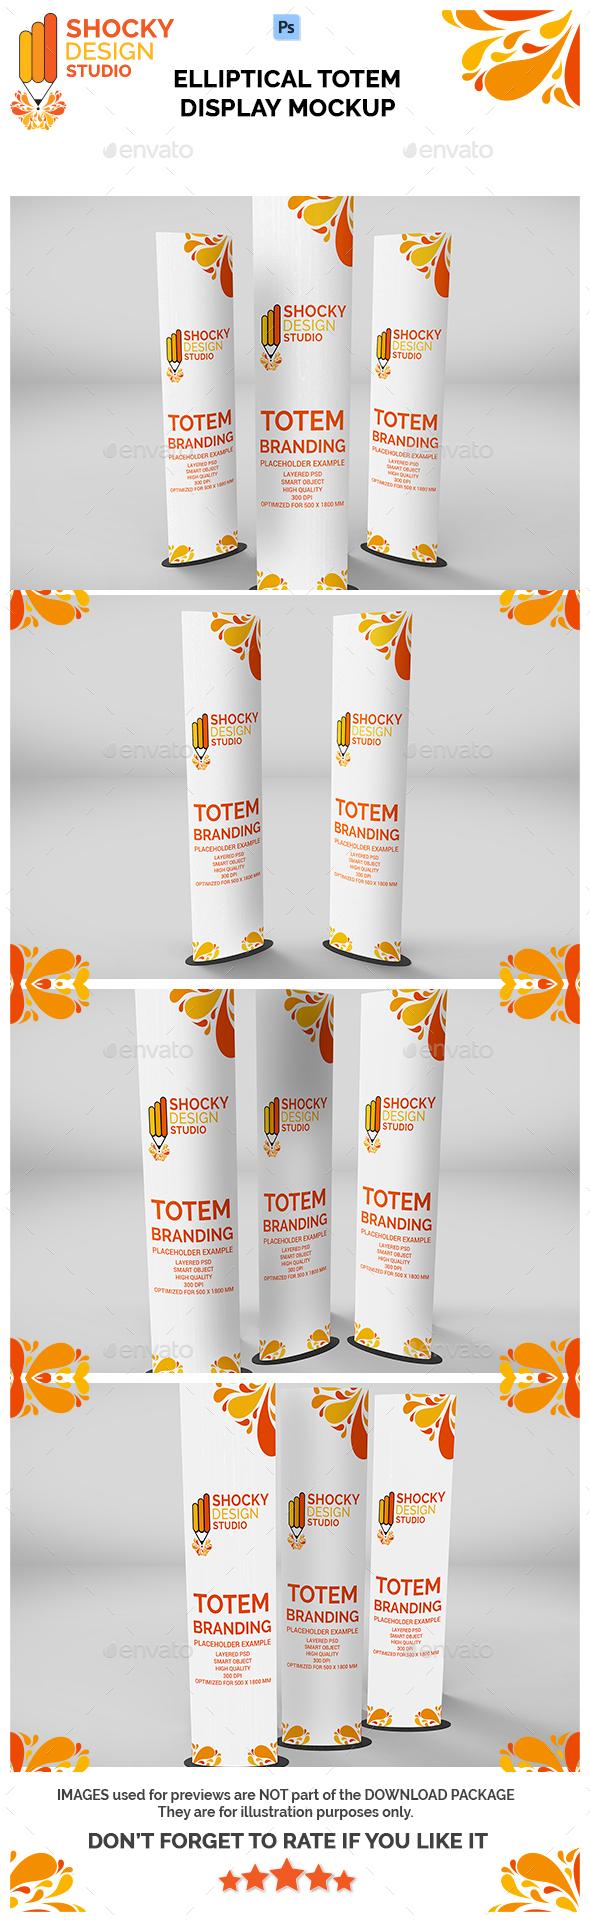 Elliptical Totem Display Mockup - Product Mock-Ups Graphics